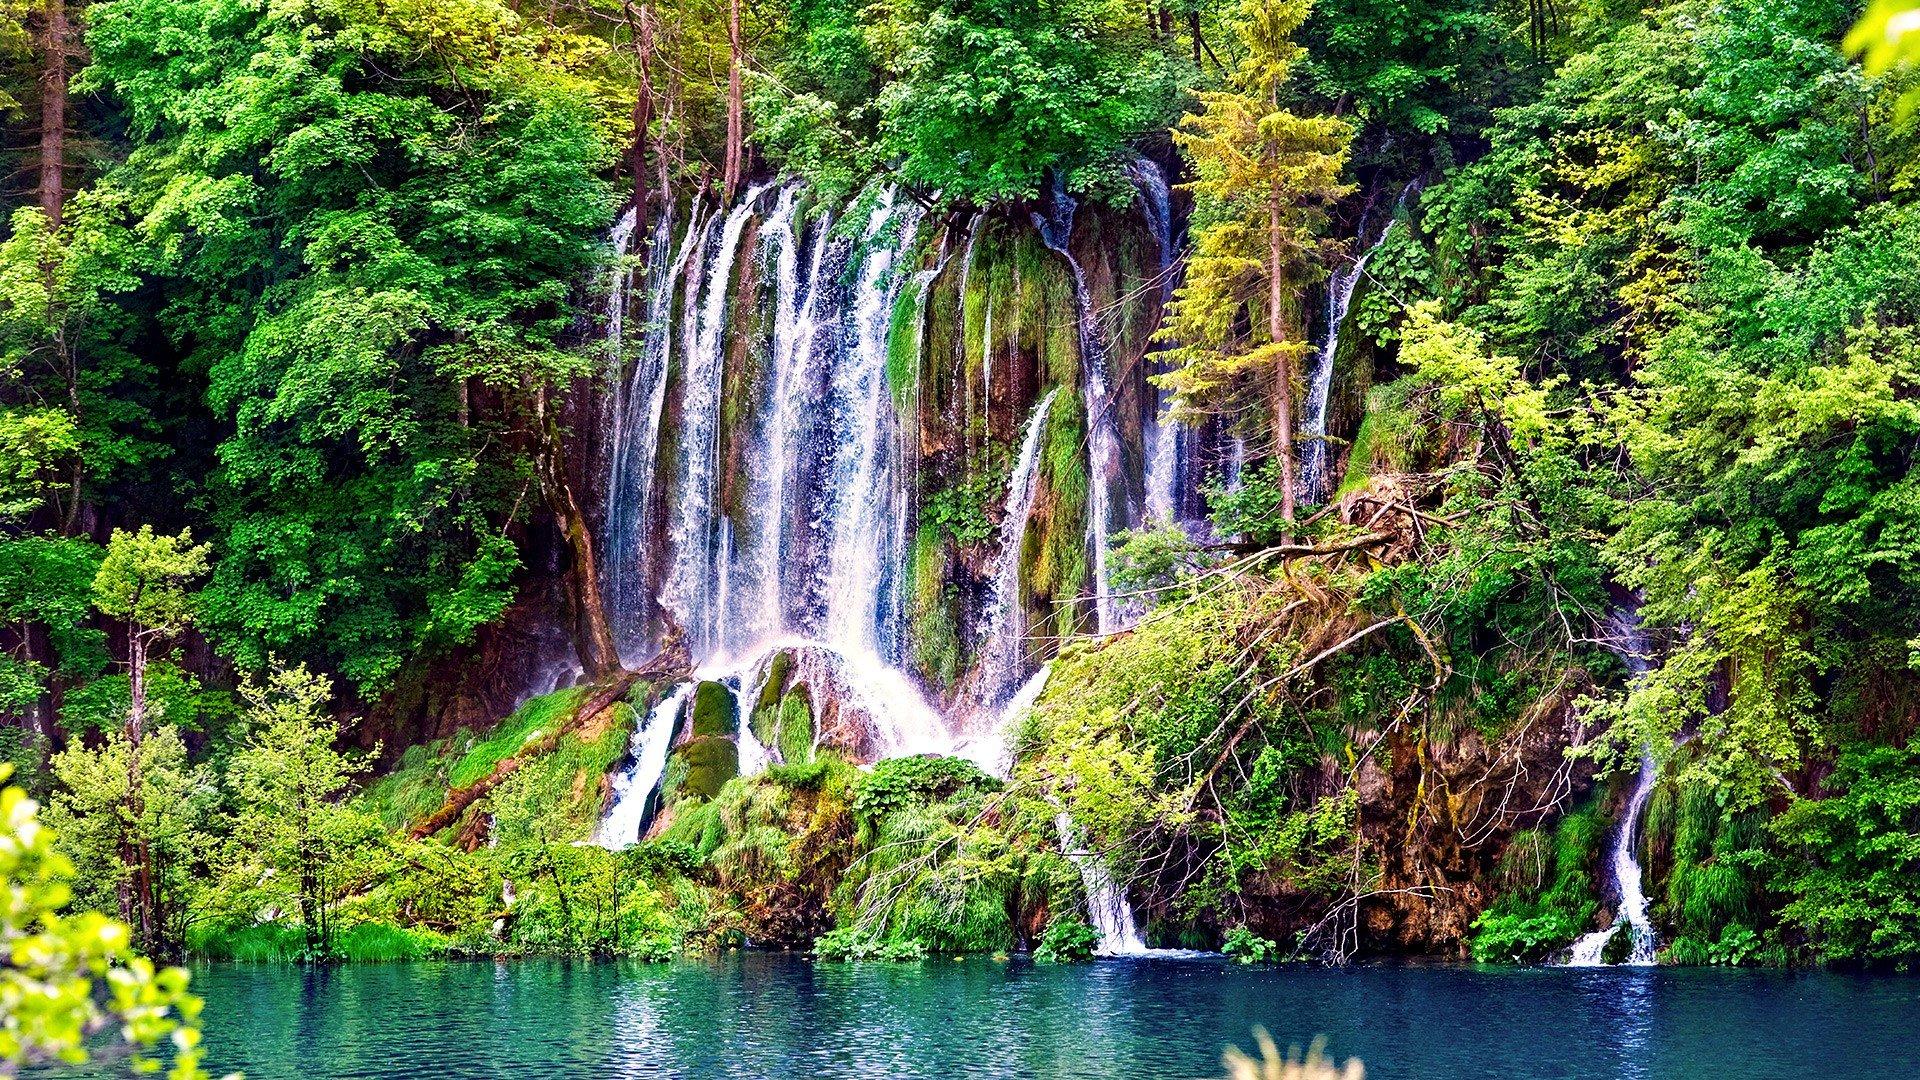 Water trees jungle waterfalls wallpaper 1920x1080 - 4k ultra hd wallpapers for desktop ...